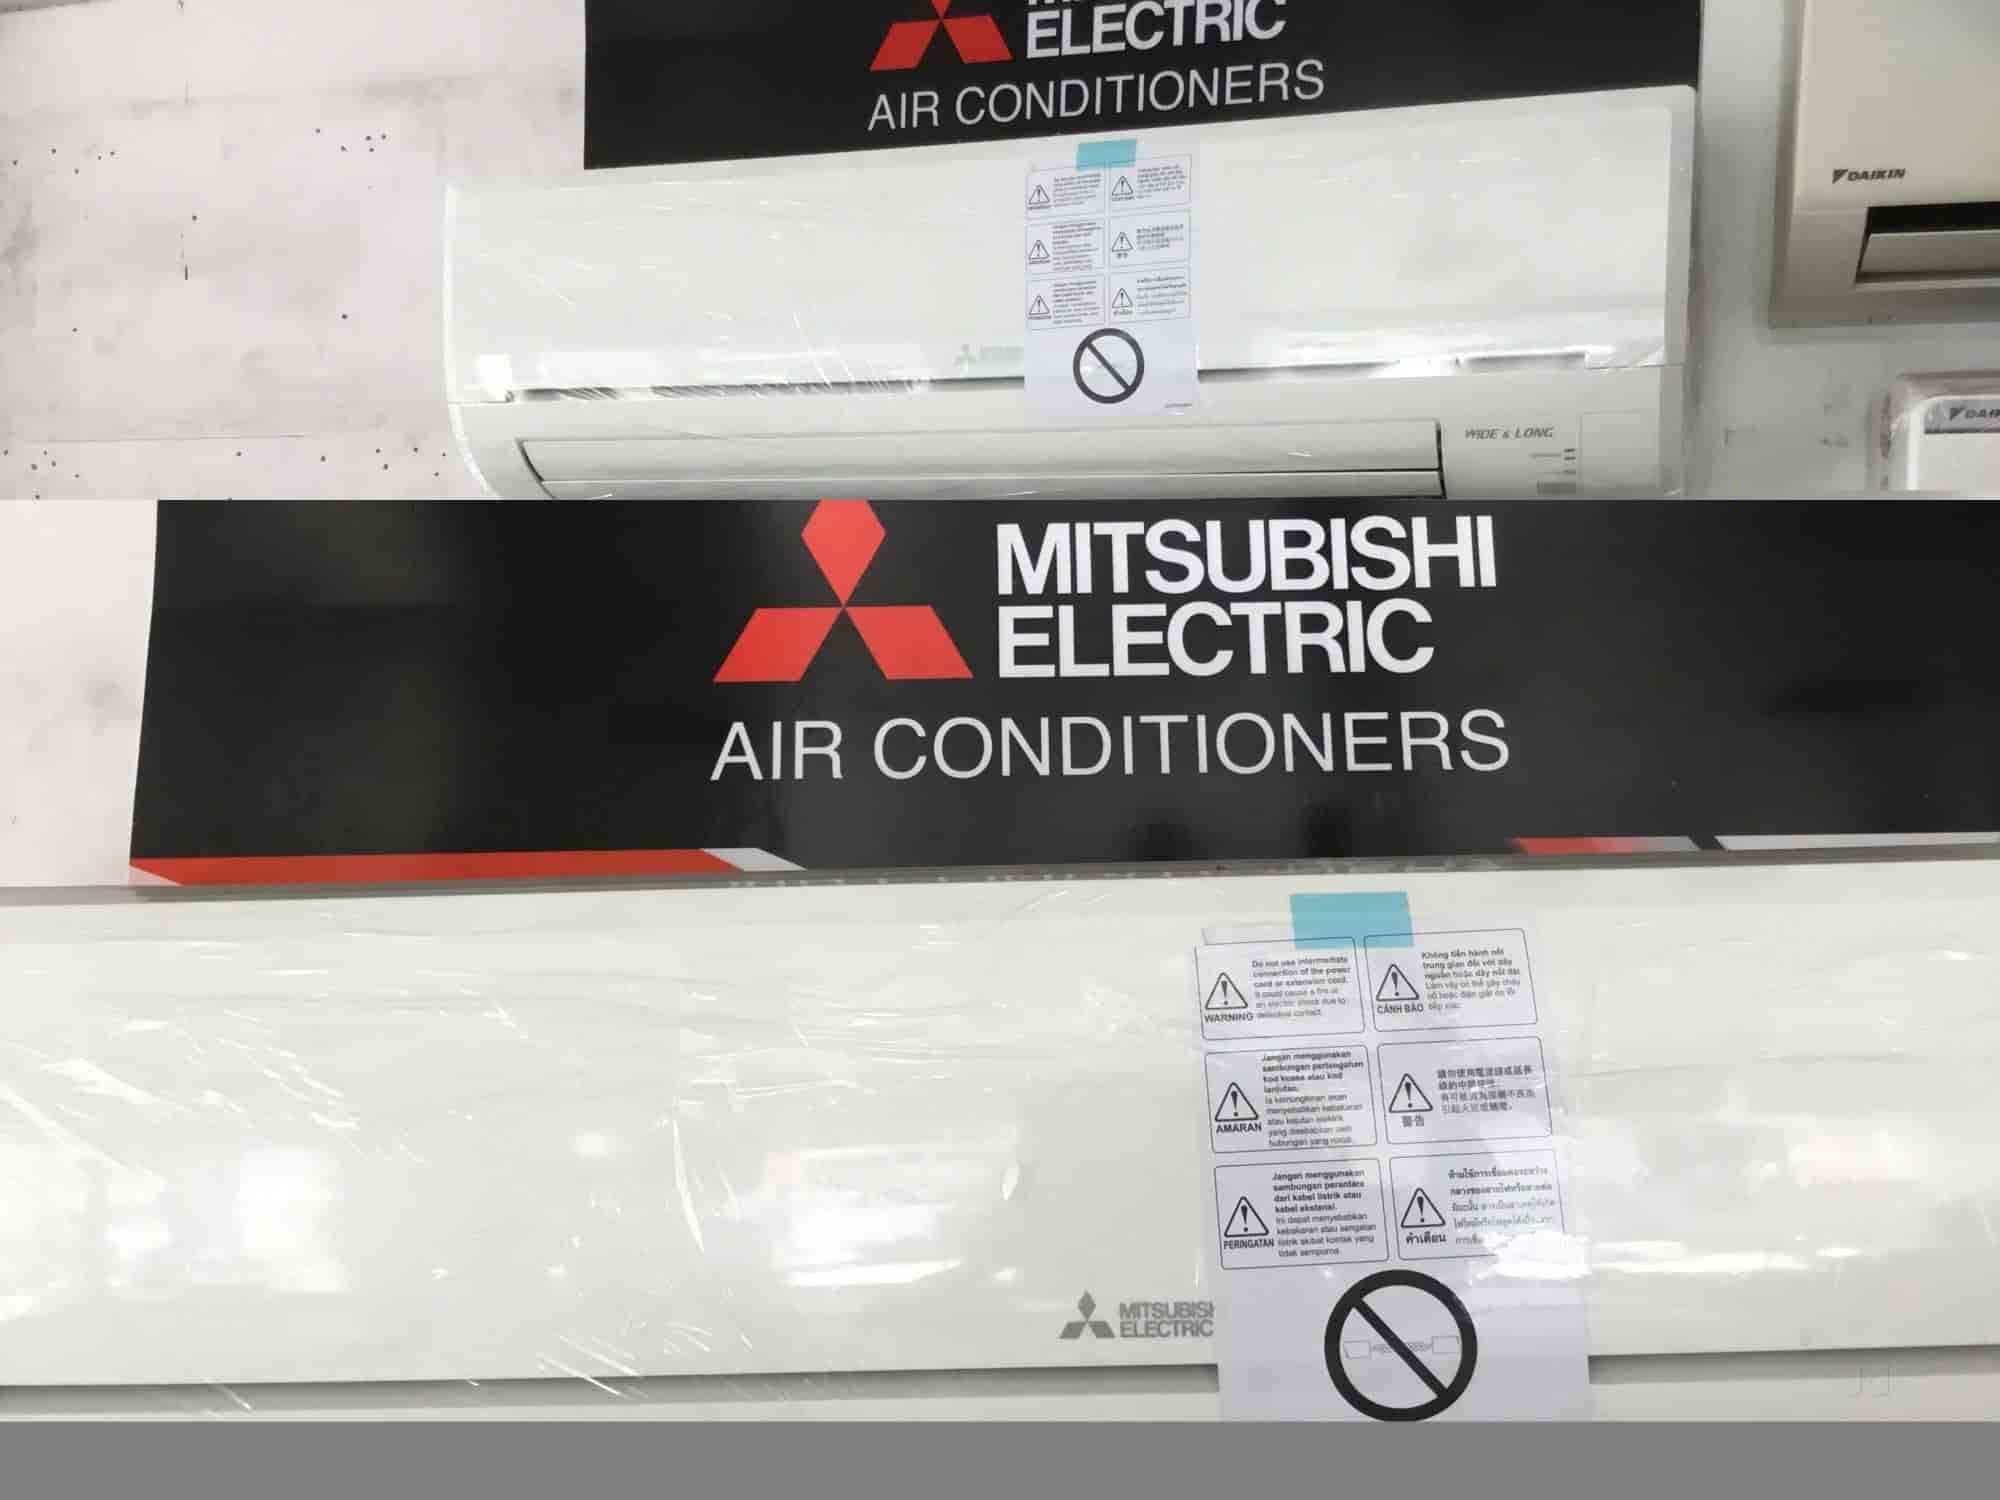 S Refrigeration Appliances Photos Gomti Nagar Lucknow Pictures Sambungan Shock Ac Repair Services